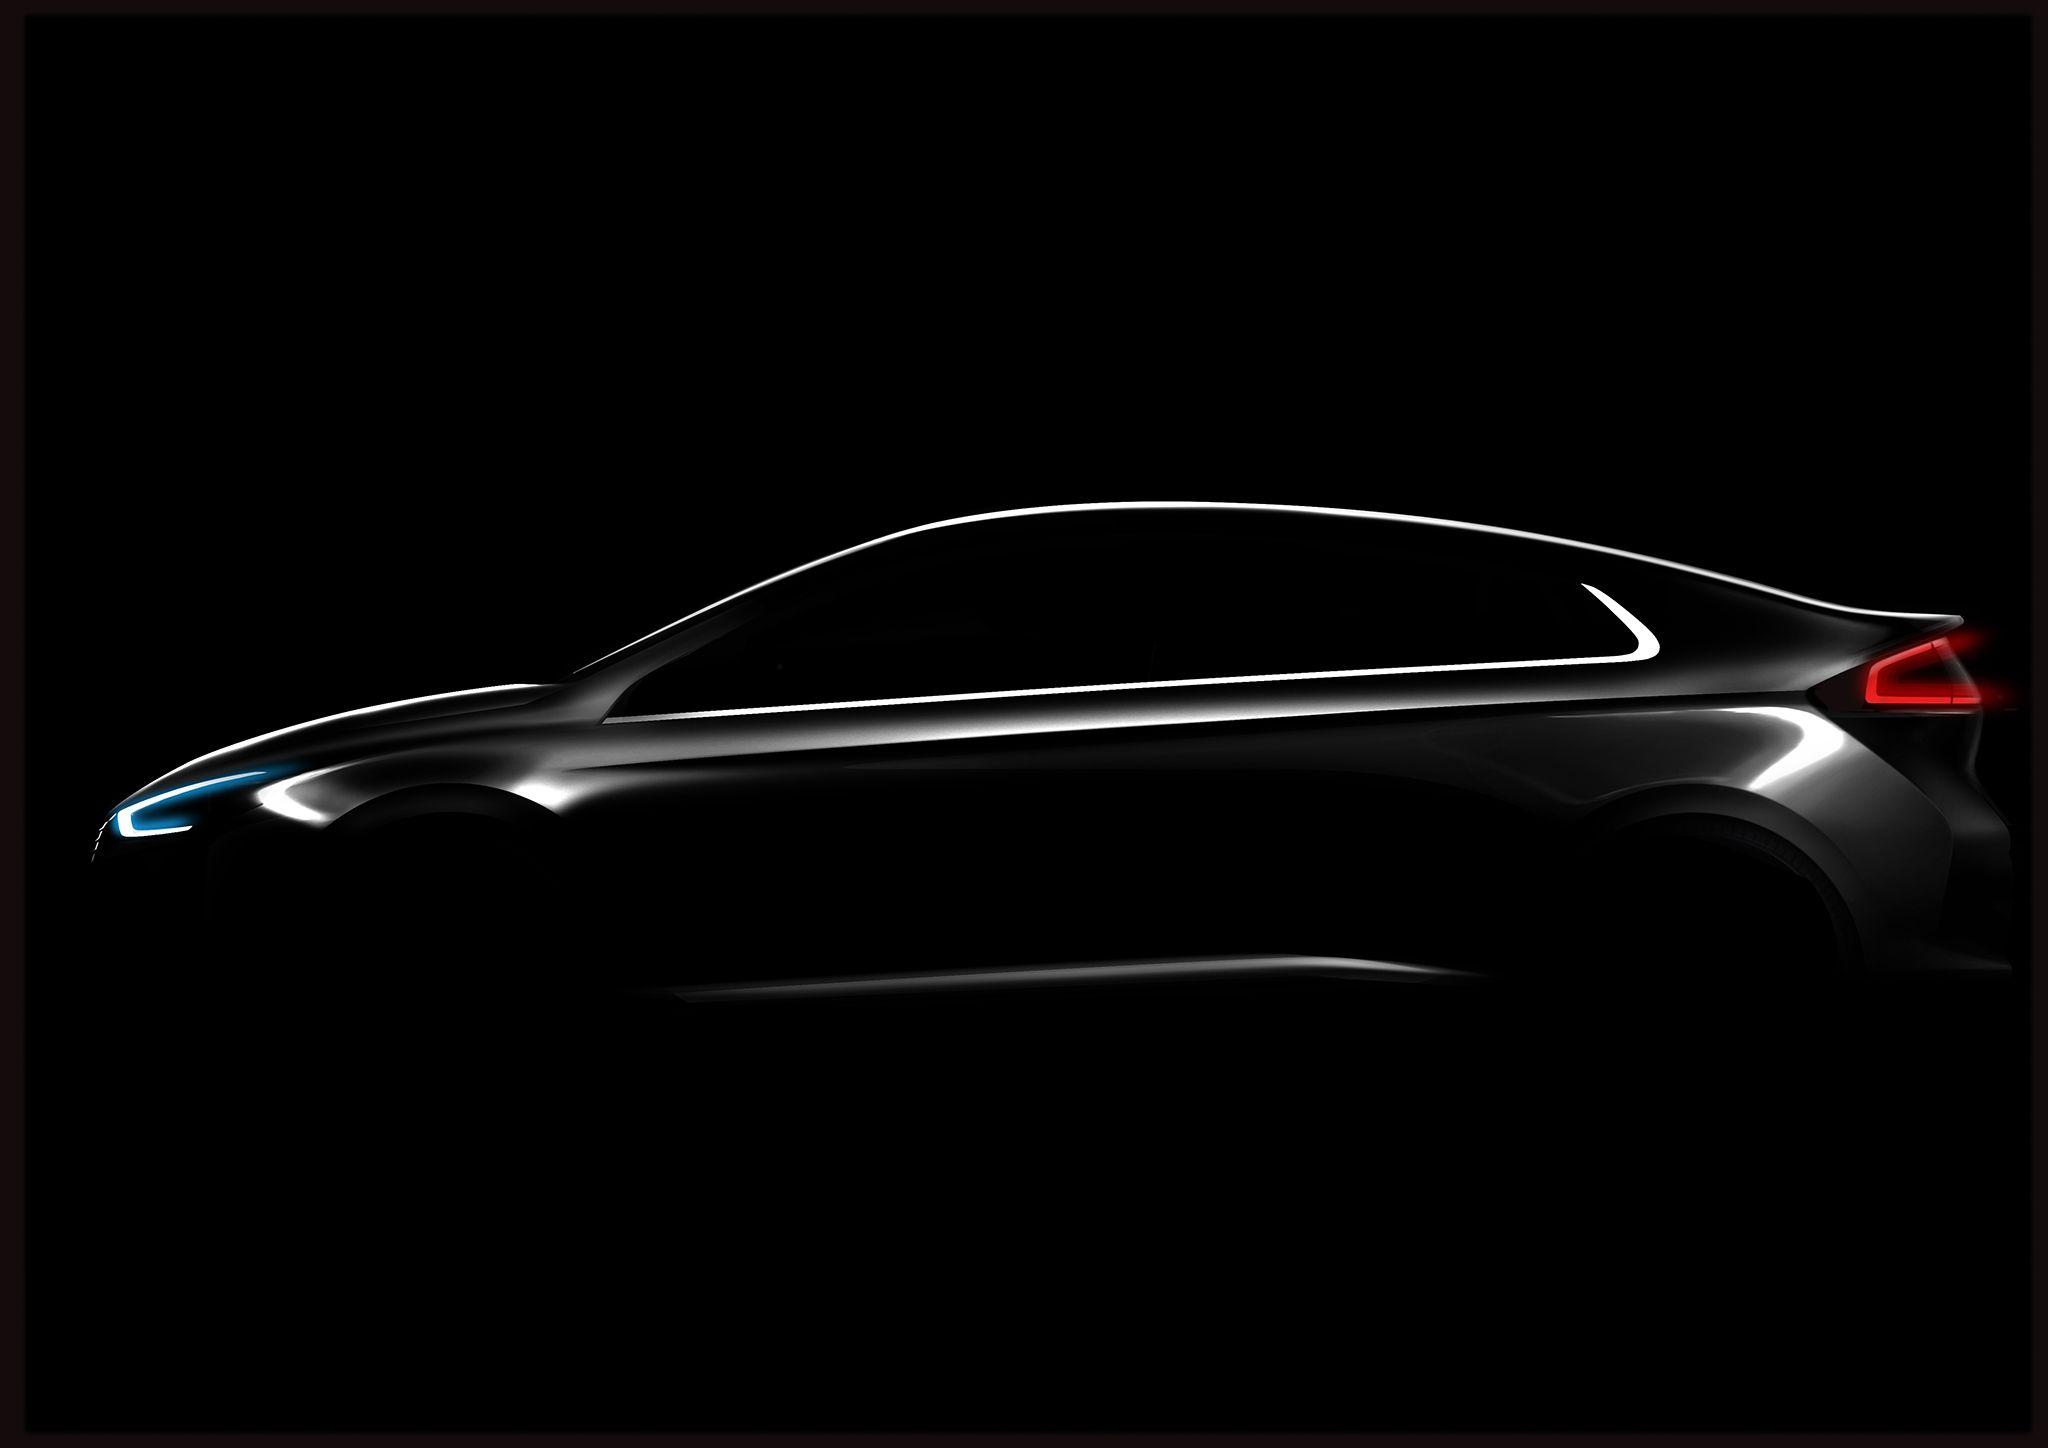 Hyundai set to launch firstofitskind electric car in